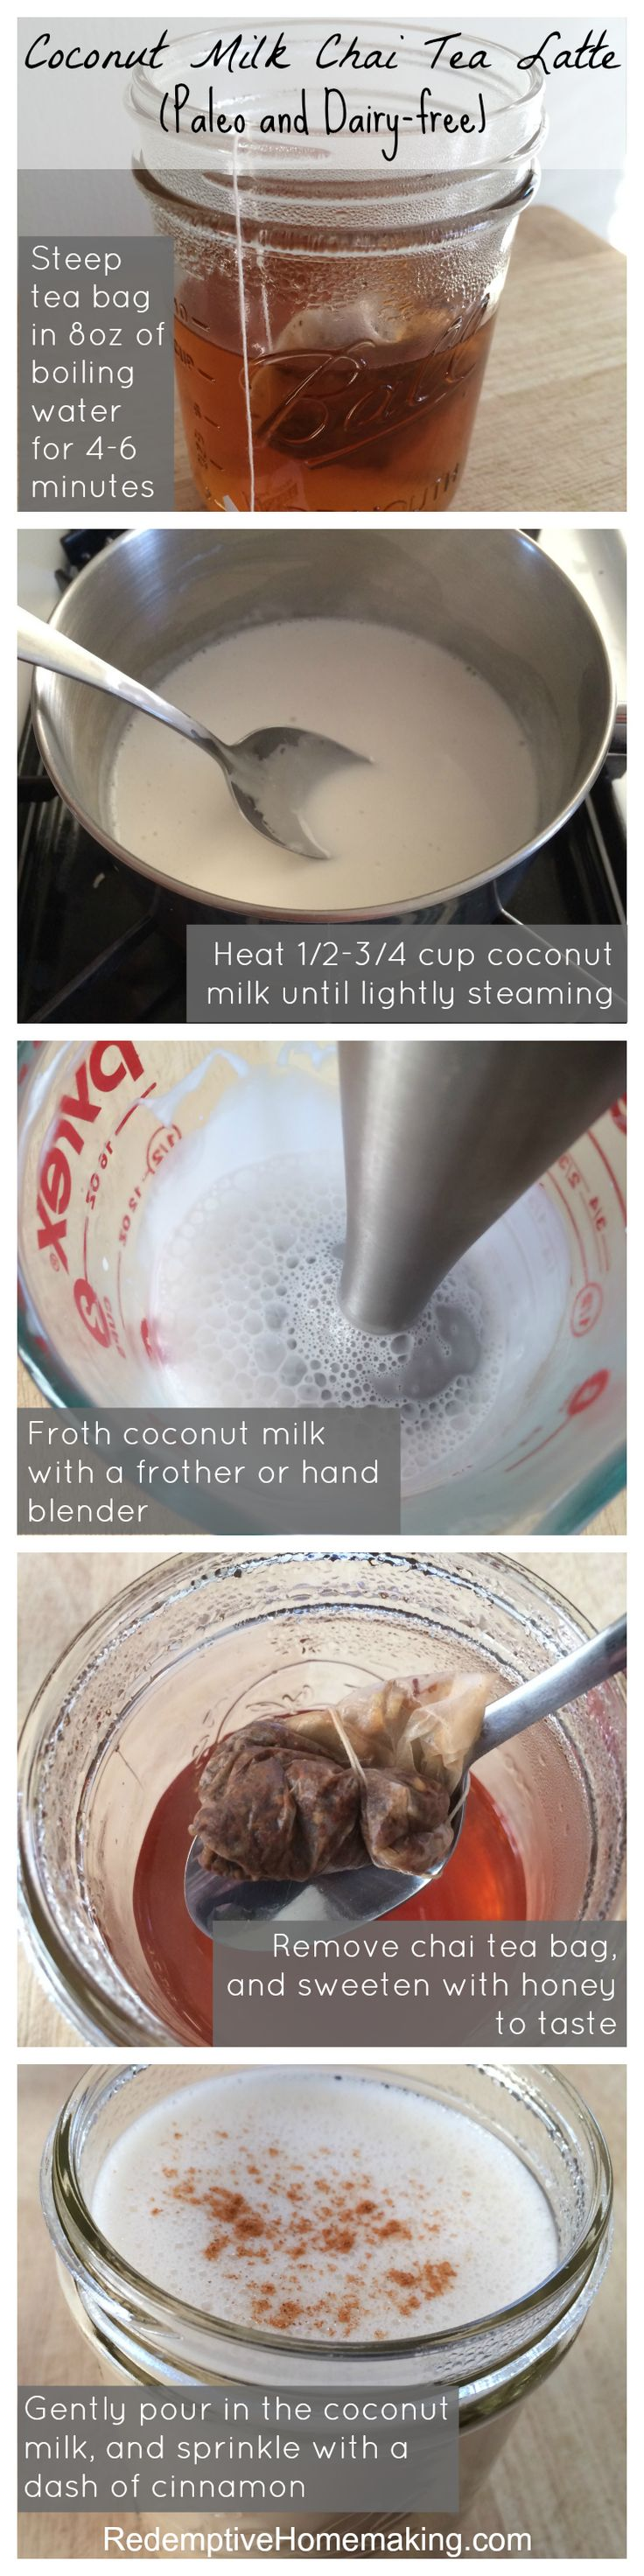 Coconut Milk Chai Tea Latte (Paleo and Dairy-free) - Redemptive Homemaking